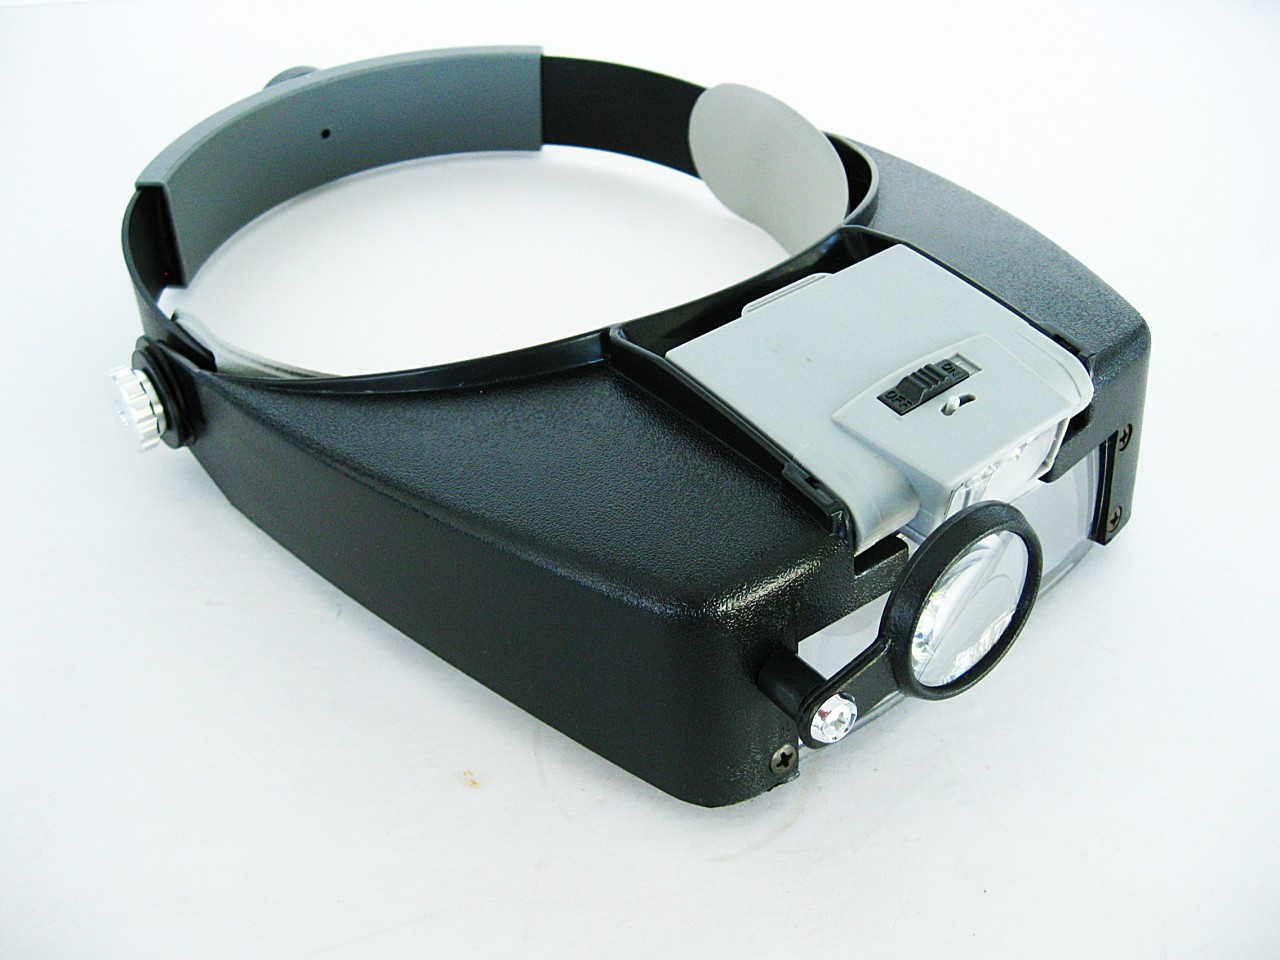 10.5X LIGHTED MAGNIFIER VISOR HEADSET Magnifying Glass